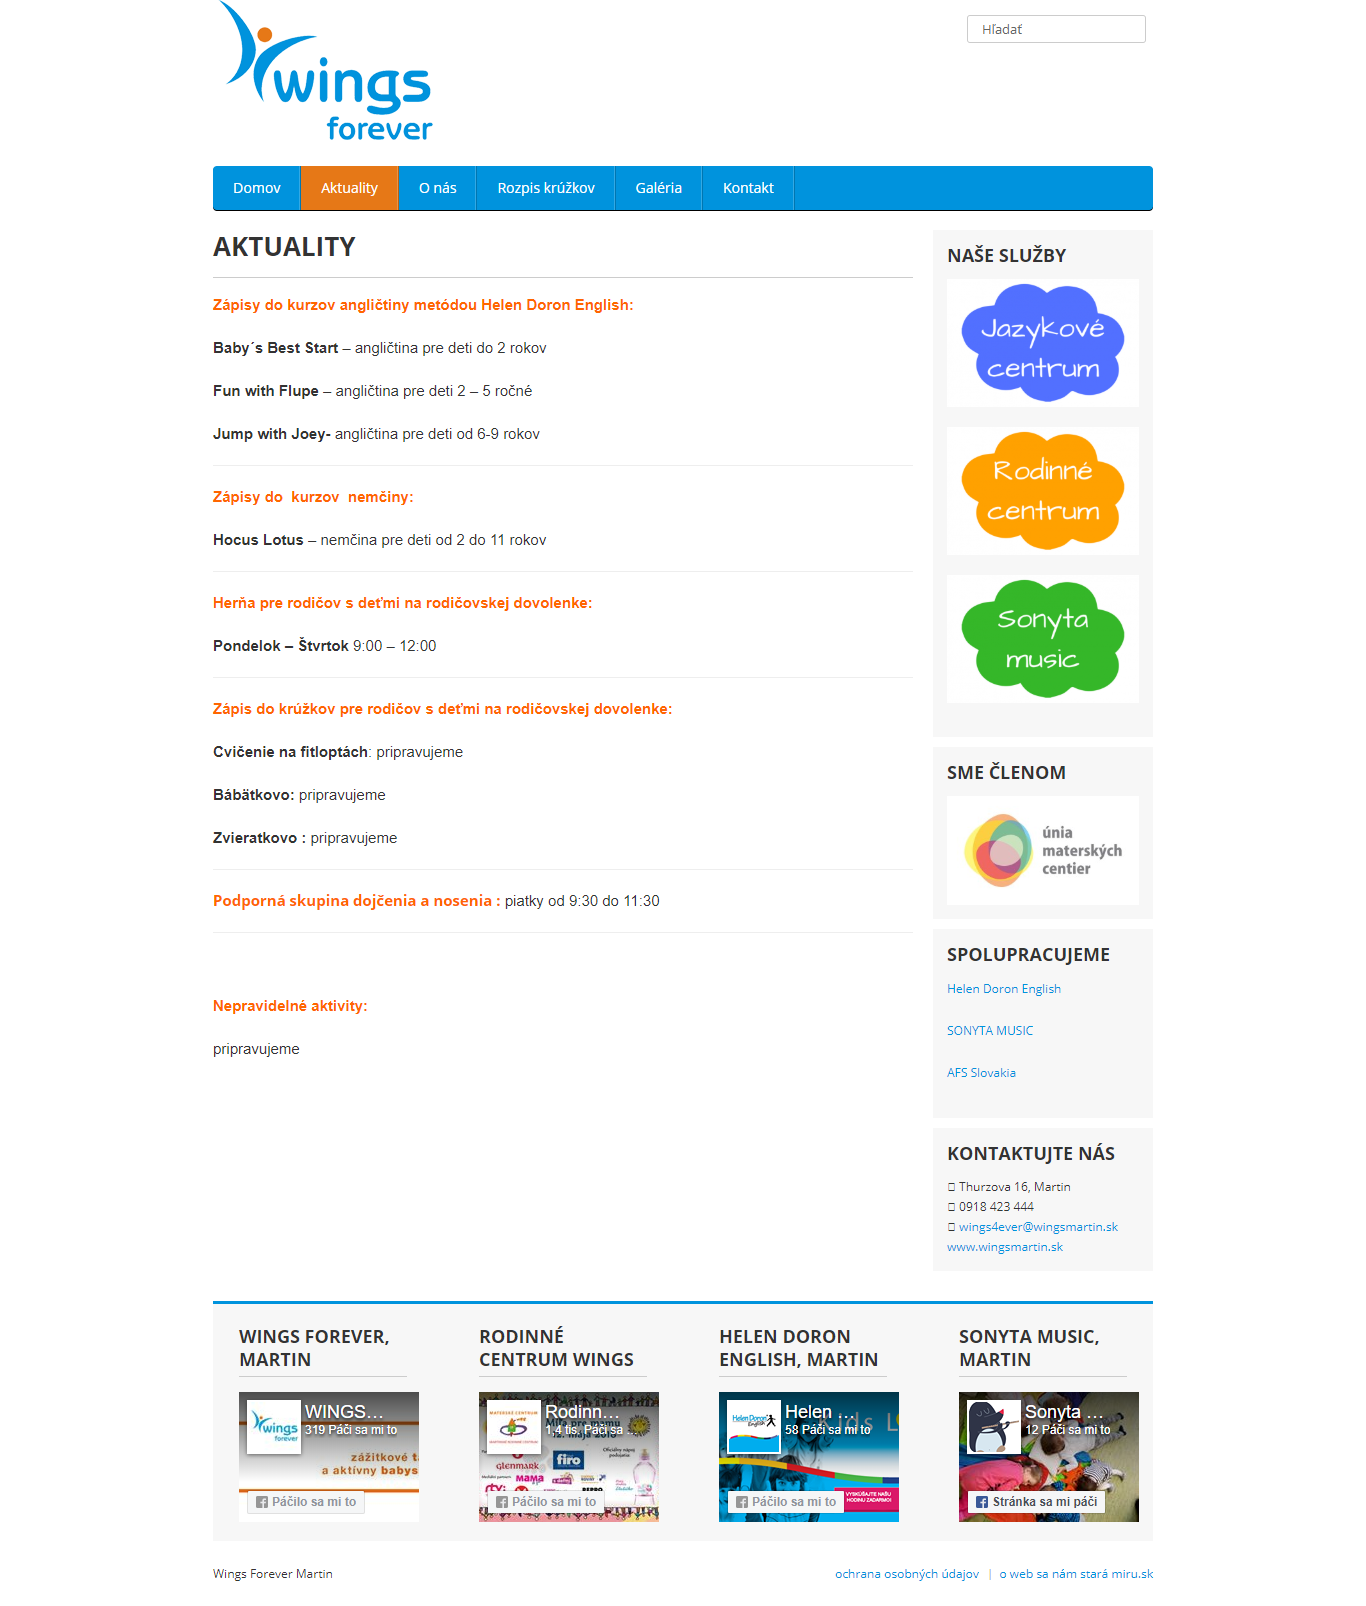 wingsmartin.sk.aktuality